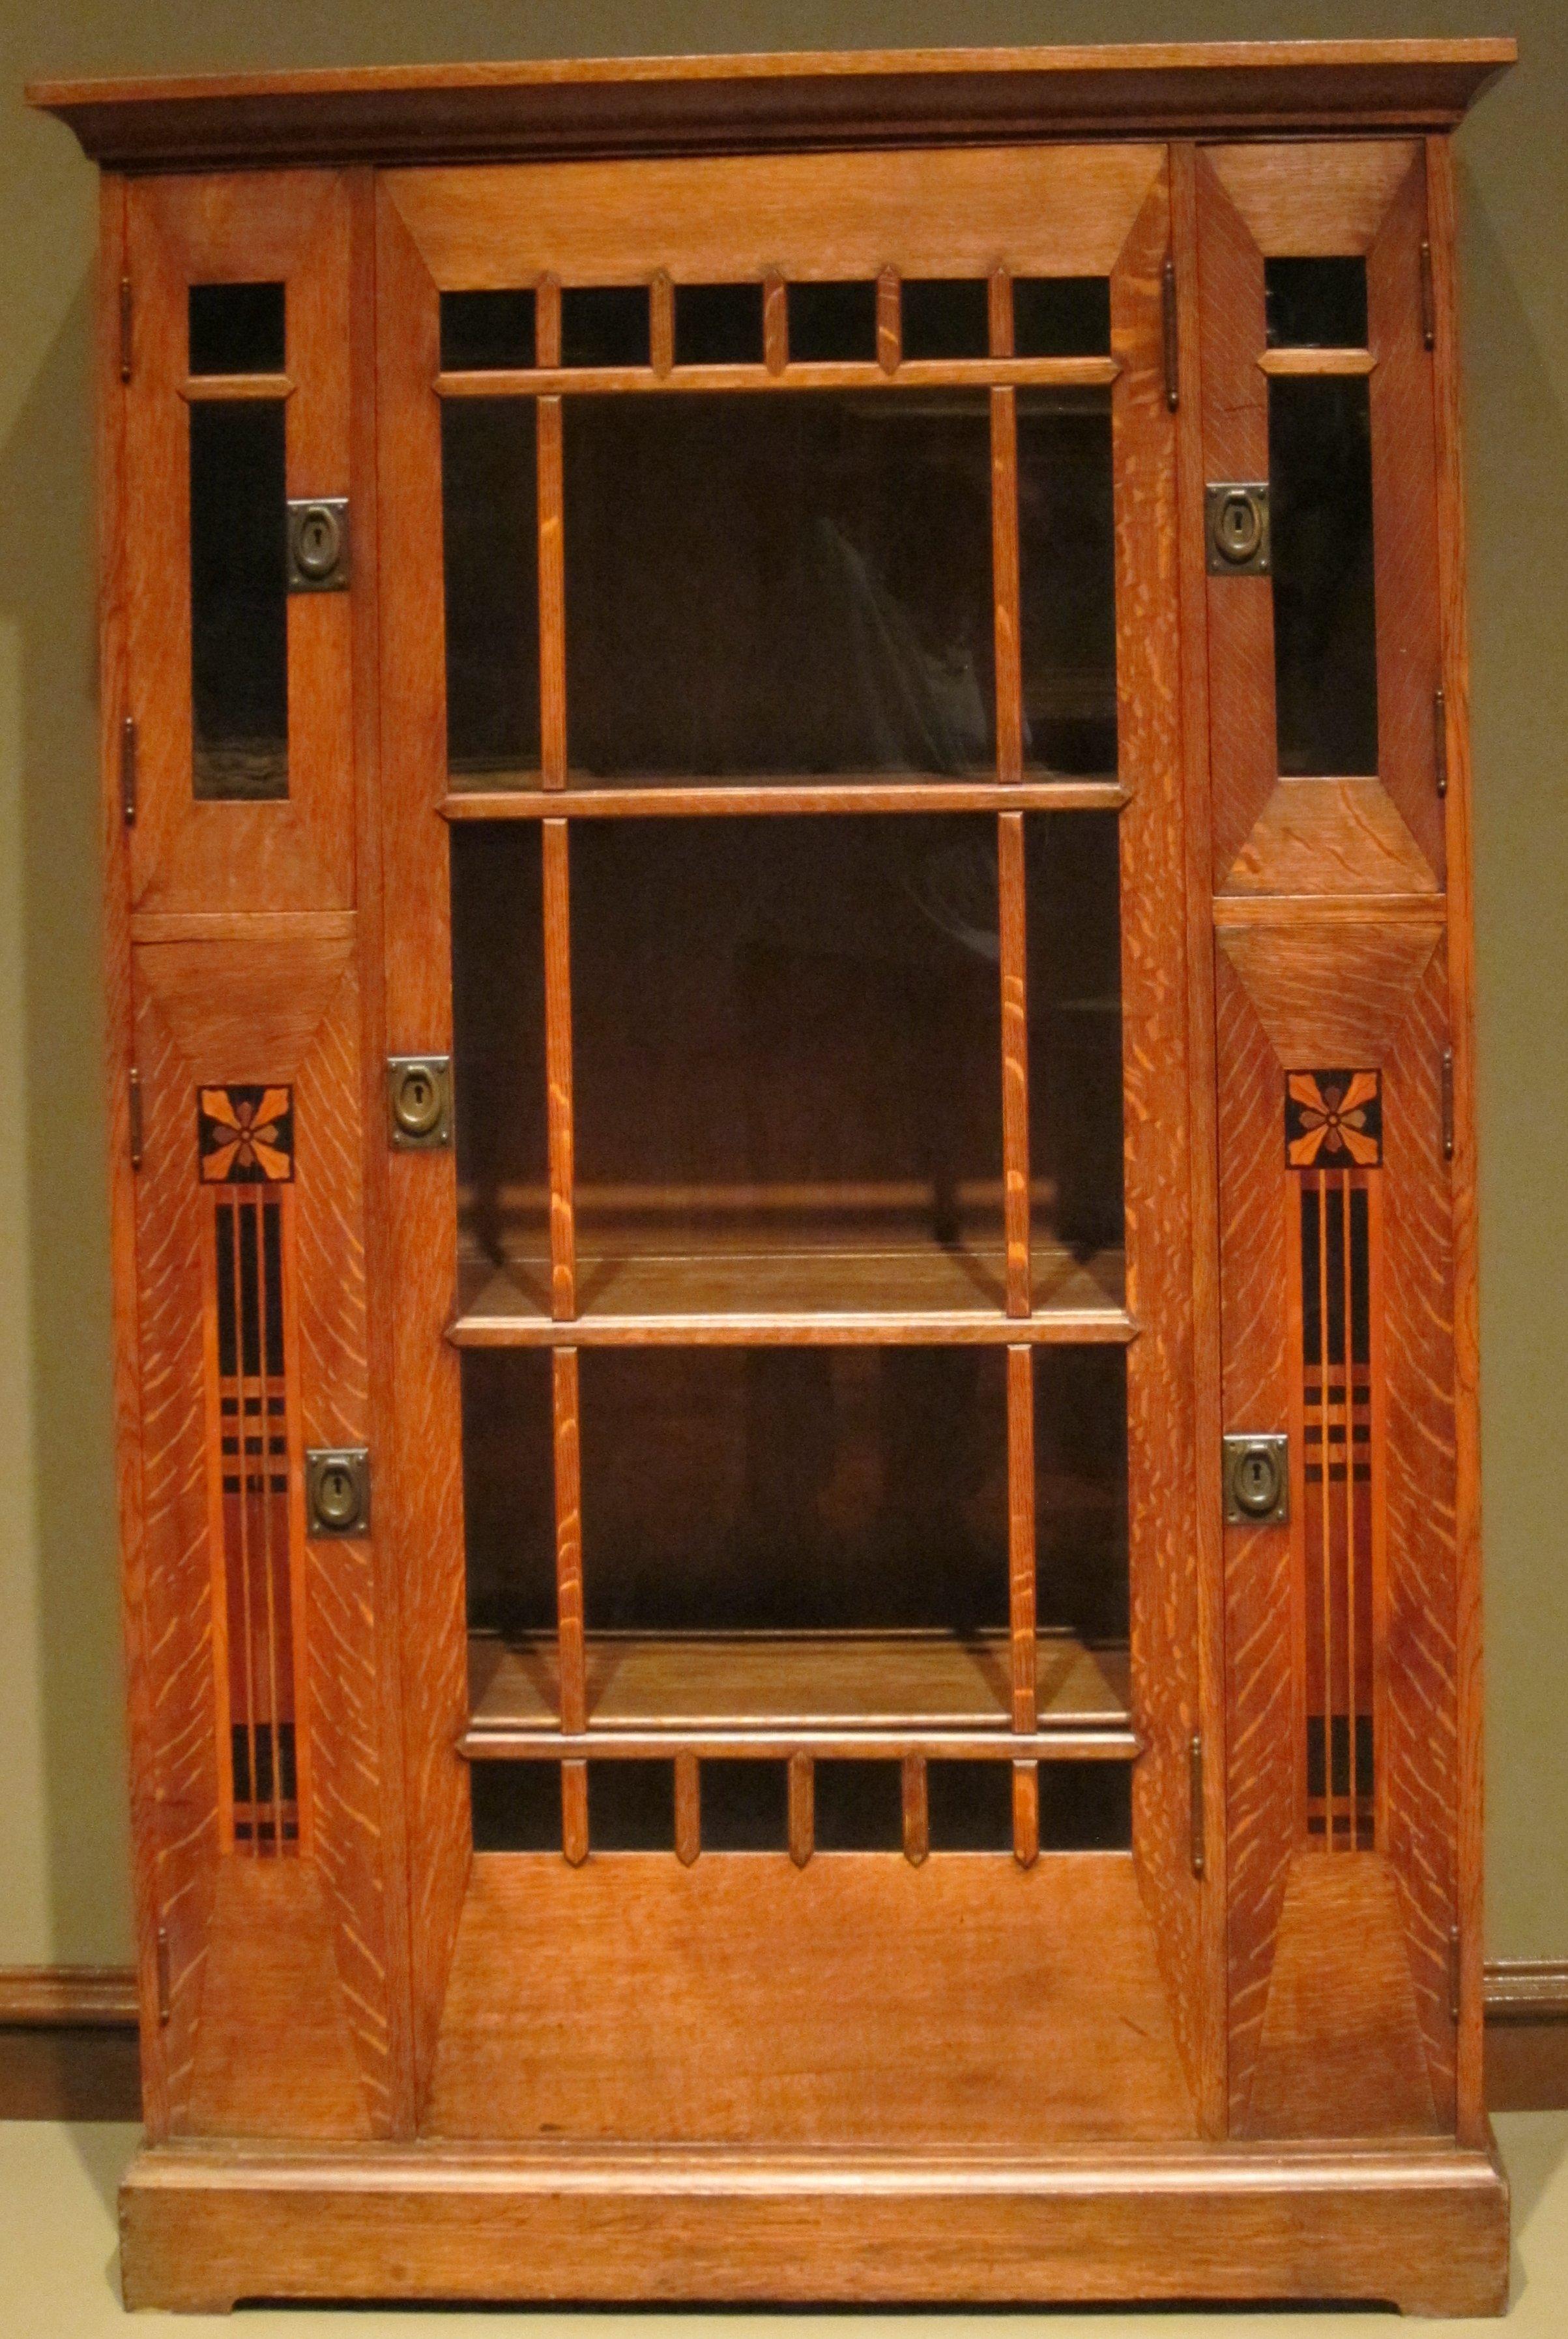 File:China Closet, Shop Of The Crafters, Cincinnati, Ohio, Dayton Art